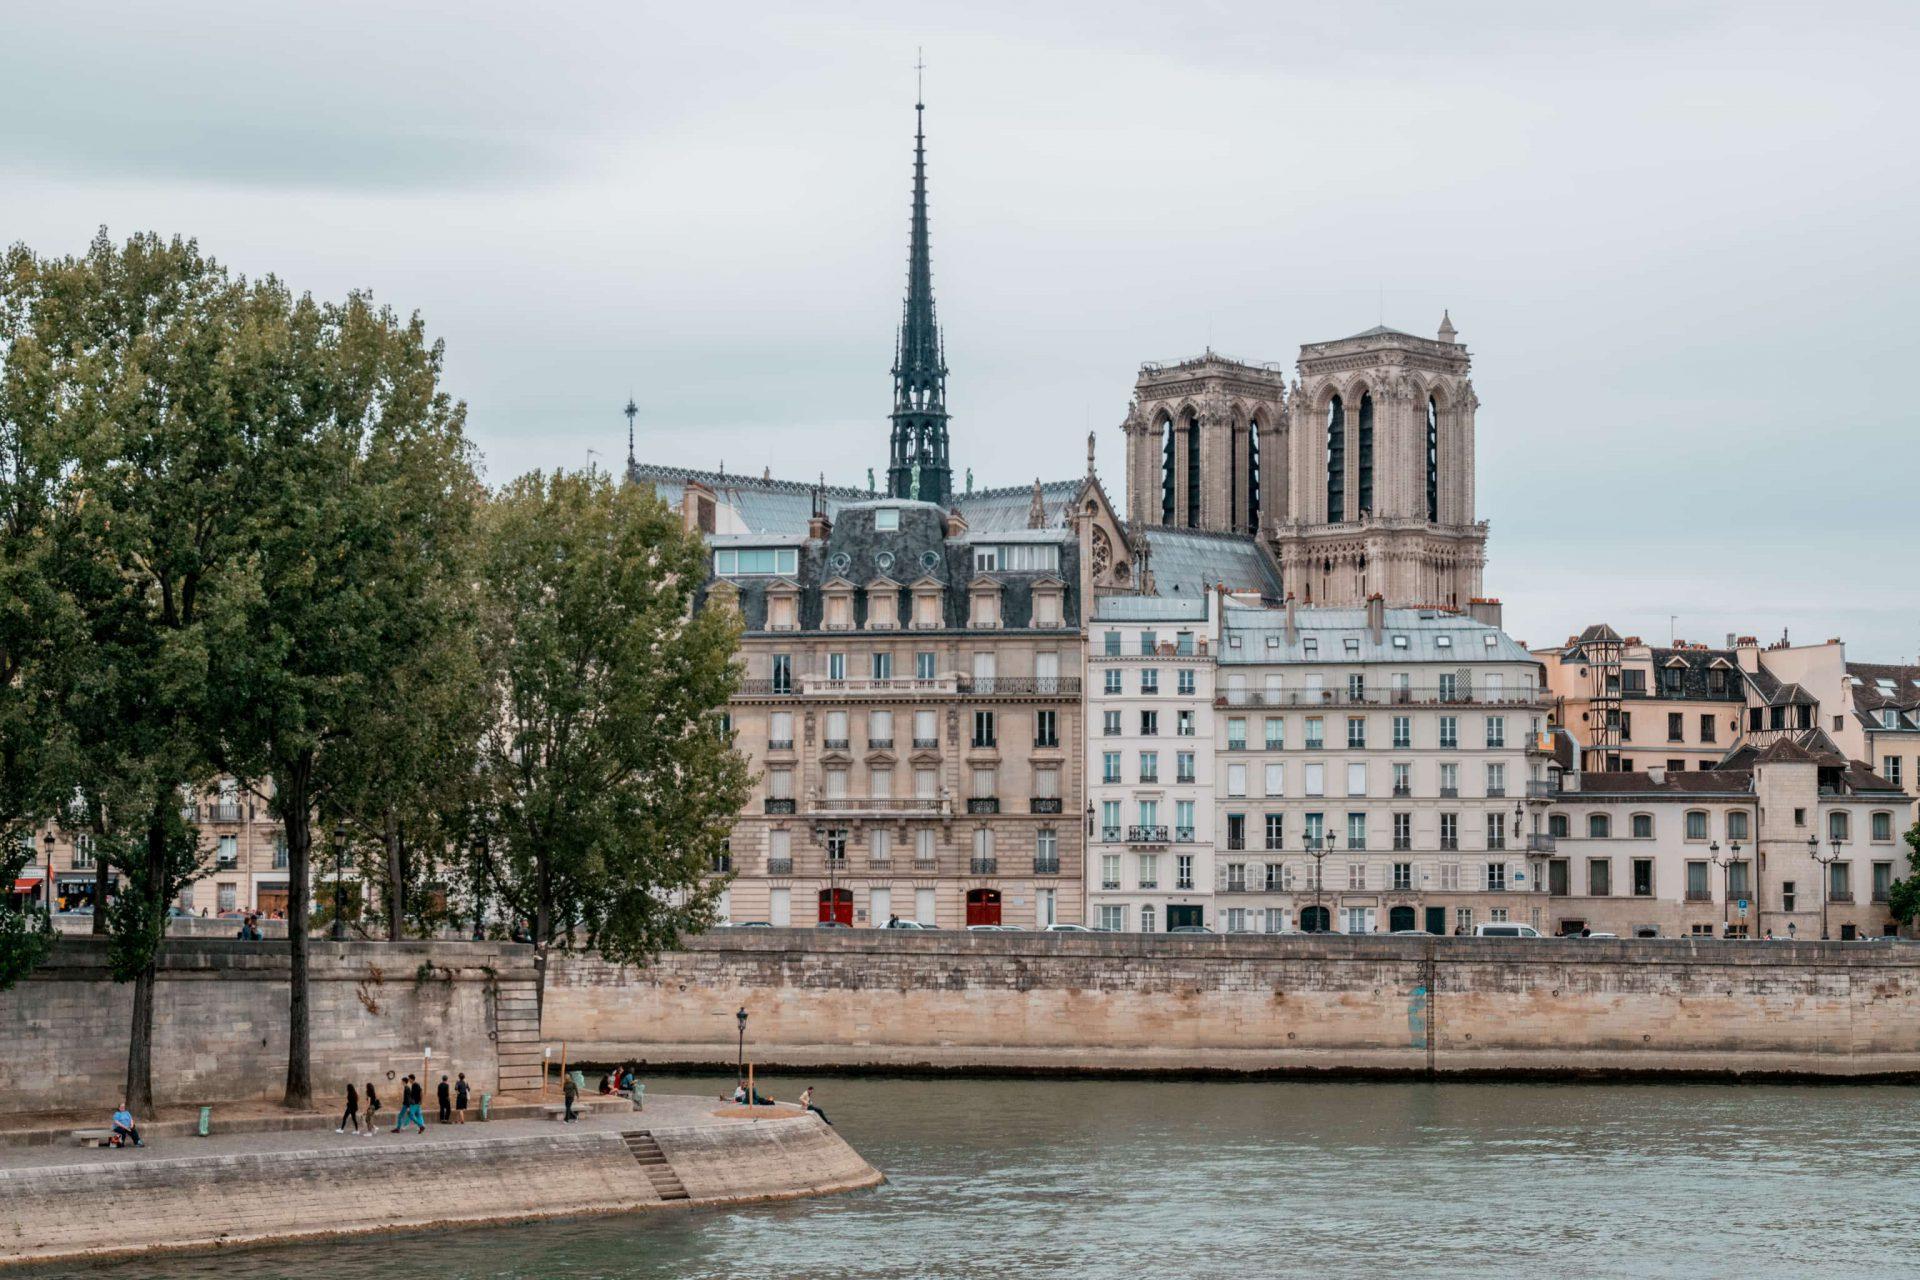 ParisMarais16 - Shopaholics opgelet: dit zijn 14 beste steden om te shoppen in Europa